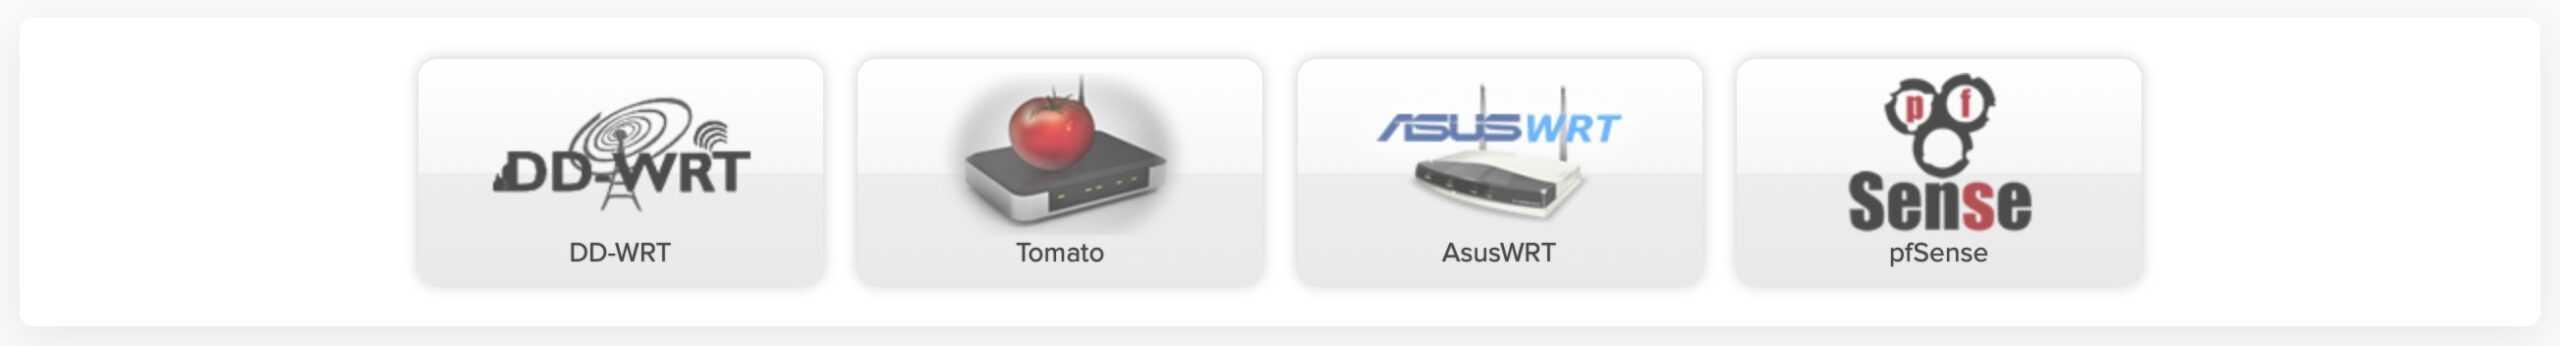 AirVPN - Router Types